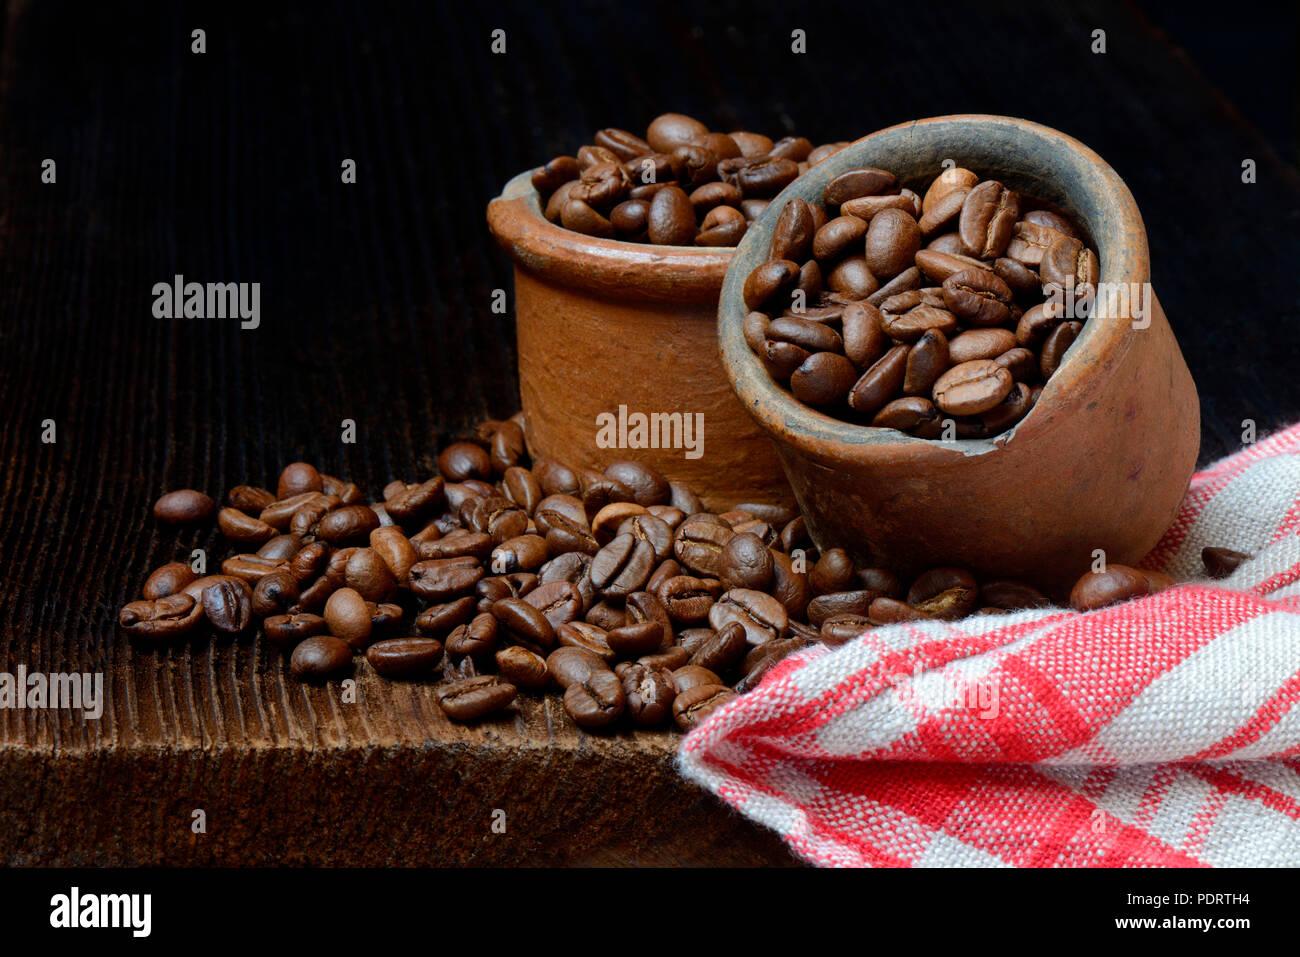 Kaffeebohnen in Keramiktoepfen, Coffea arabica, Arabica-Kaffee - Stock Image